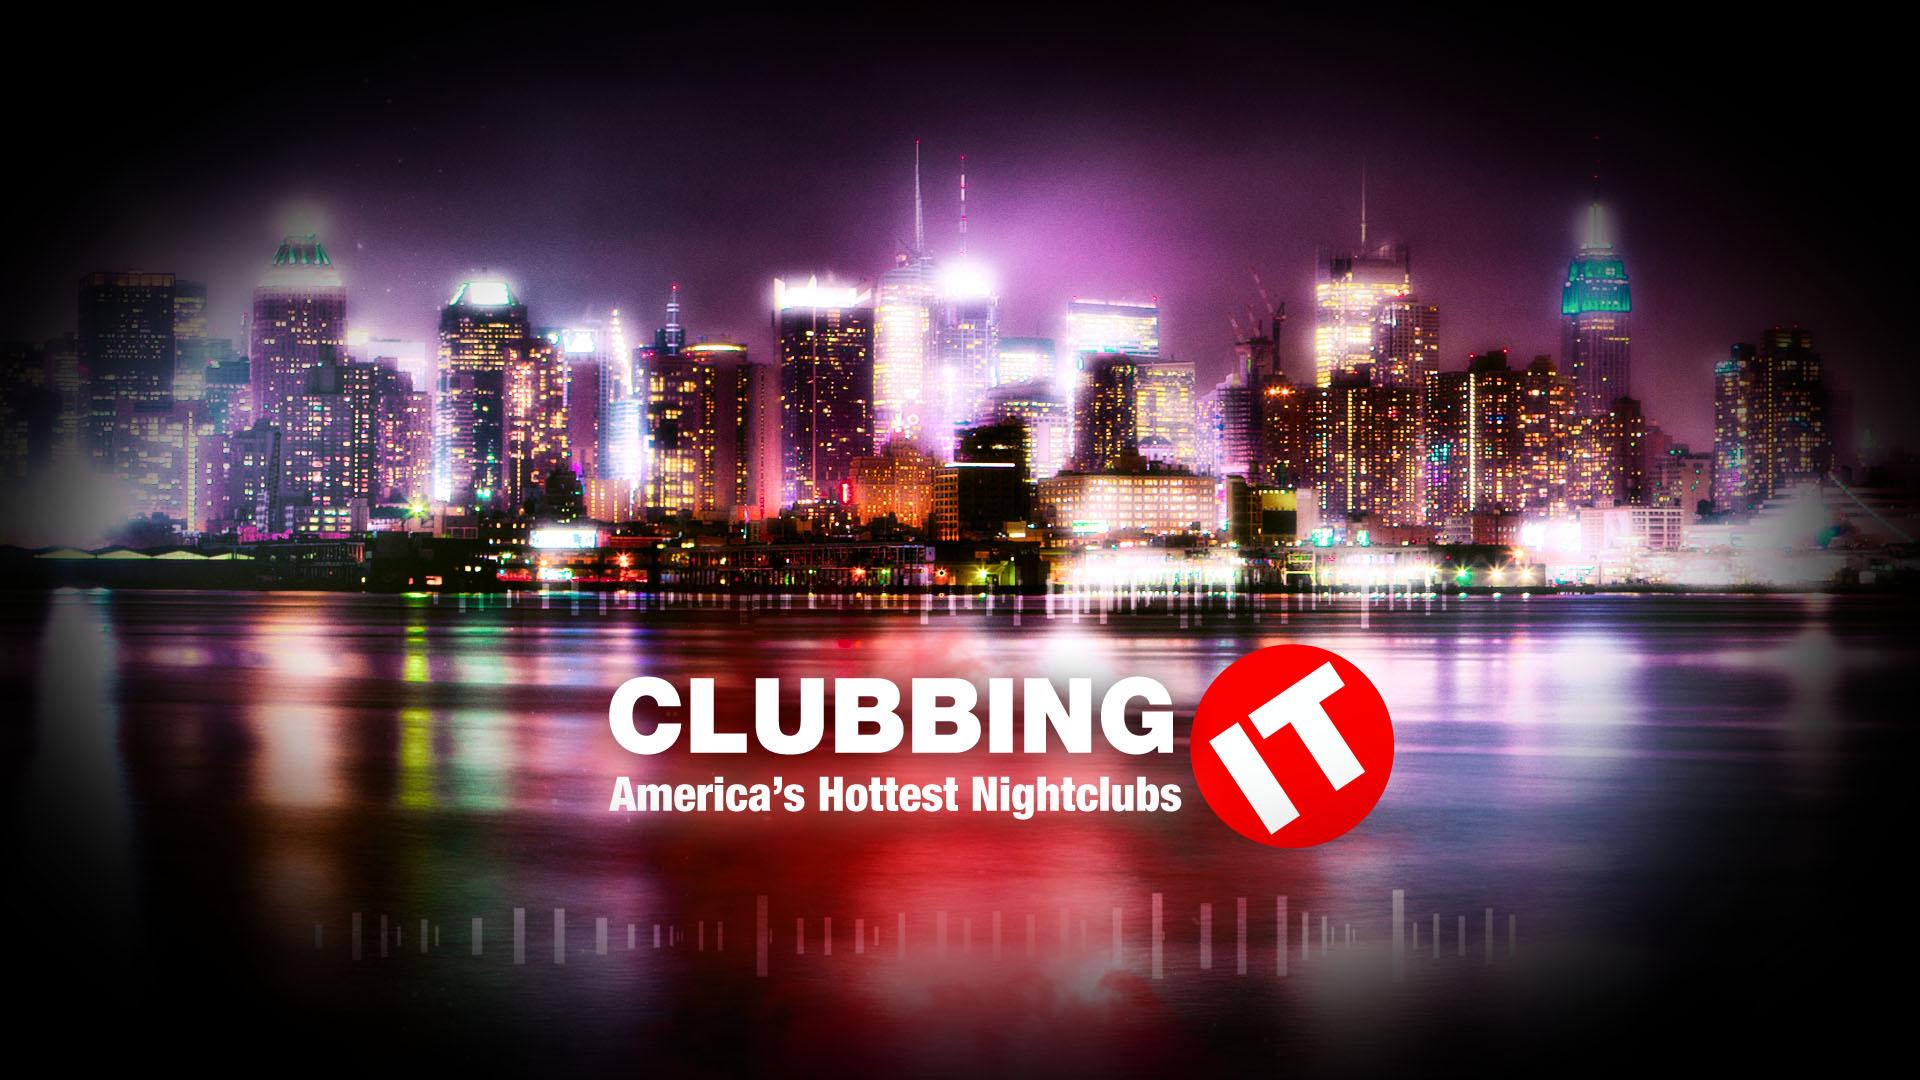 Clubbing IT TV series leader design